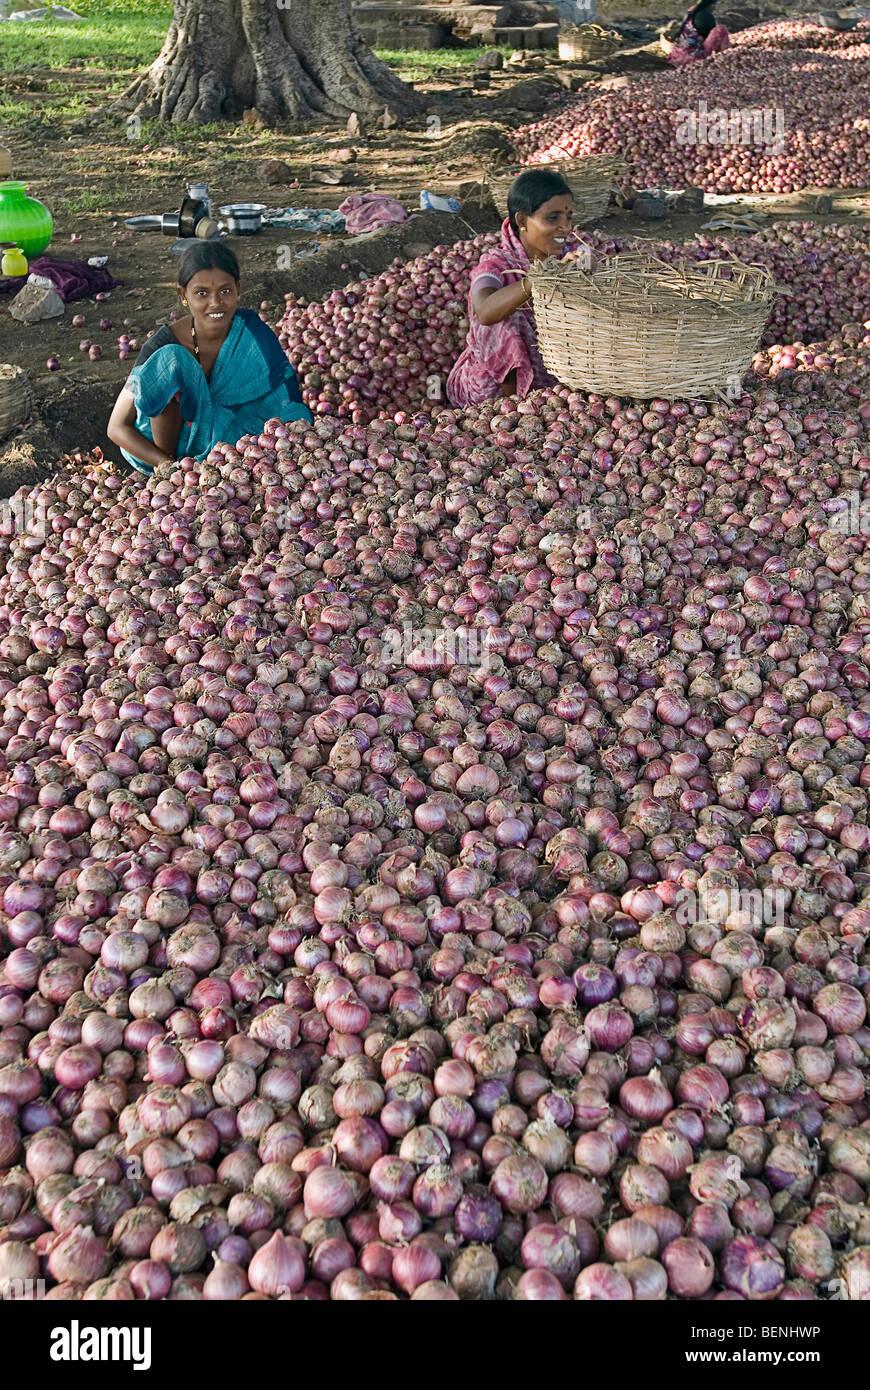 Women grading onions harvested from the fields Pattadakal Karnataka India - Stock Image